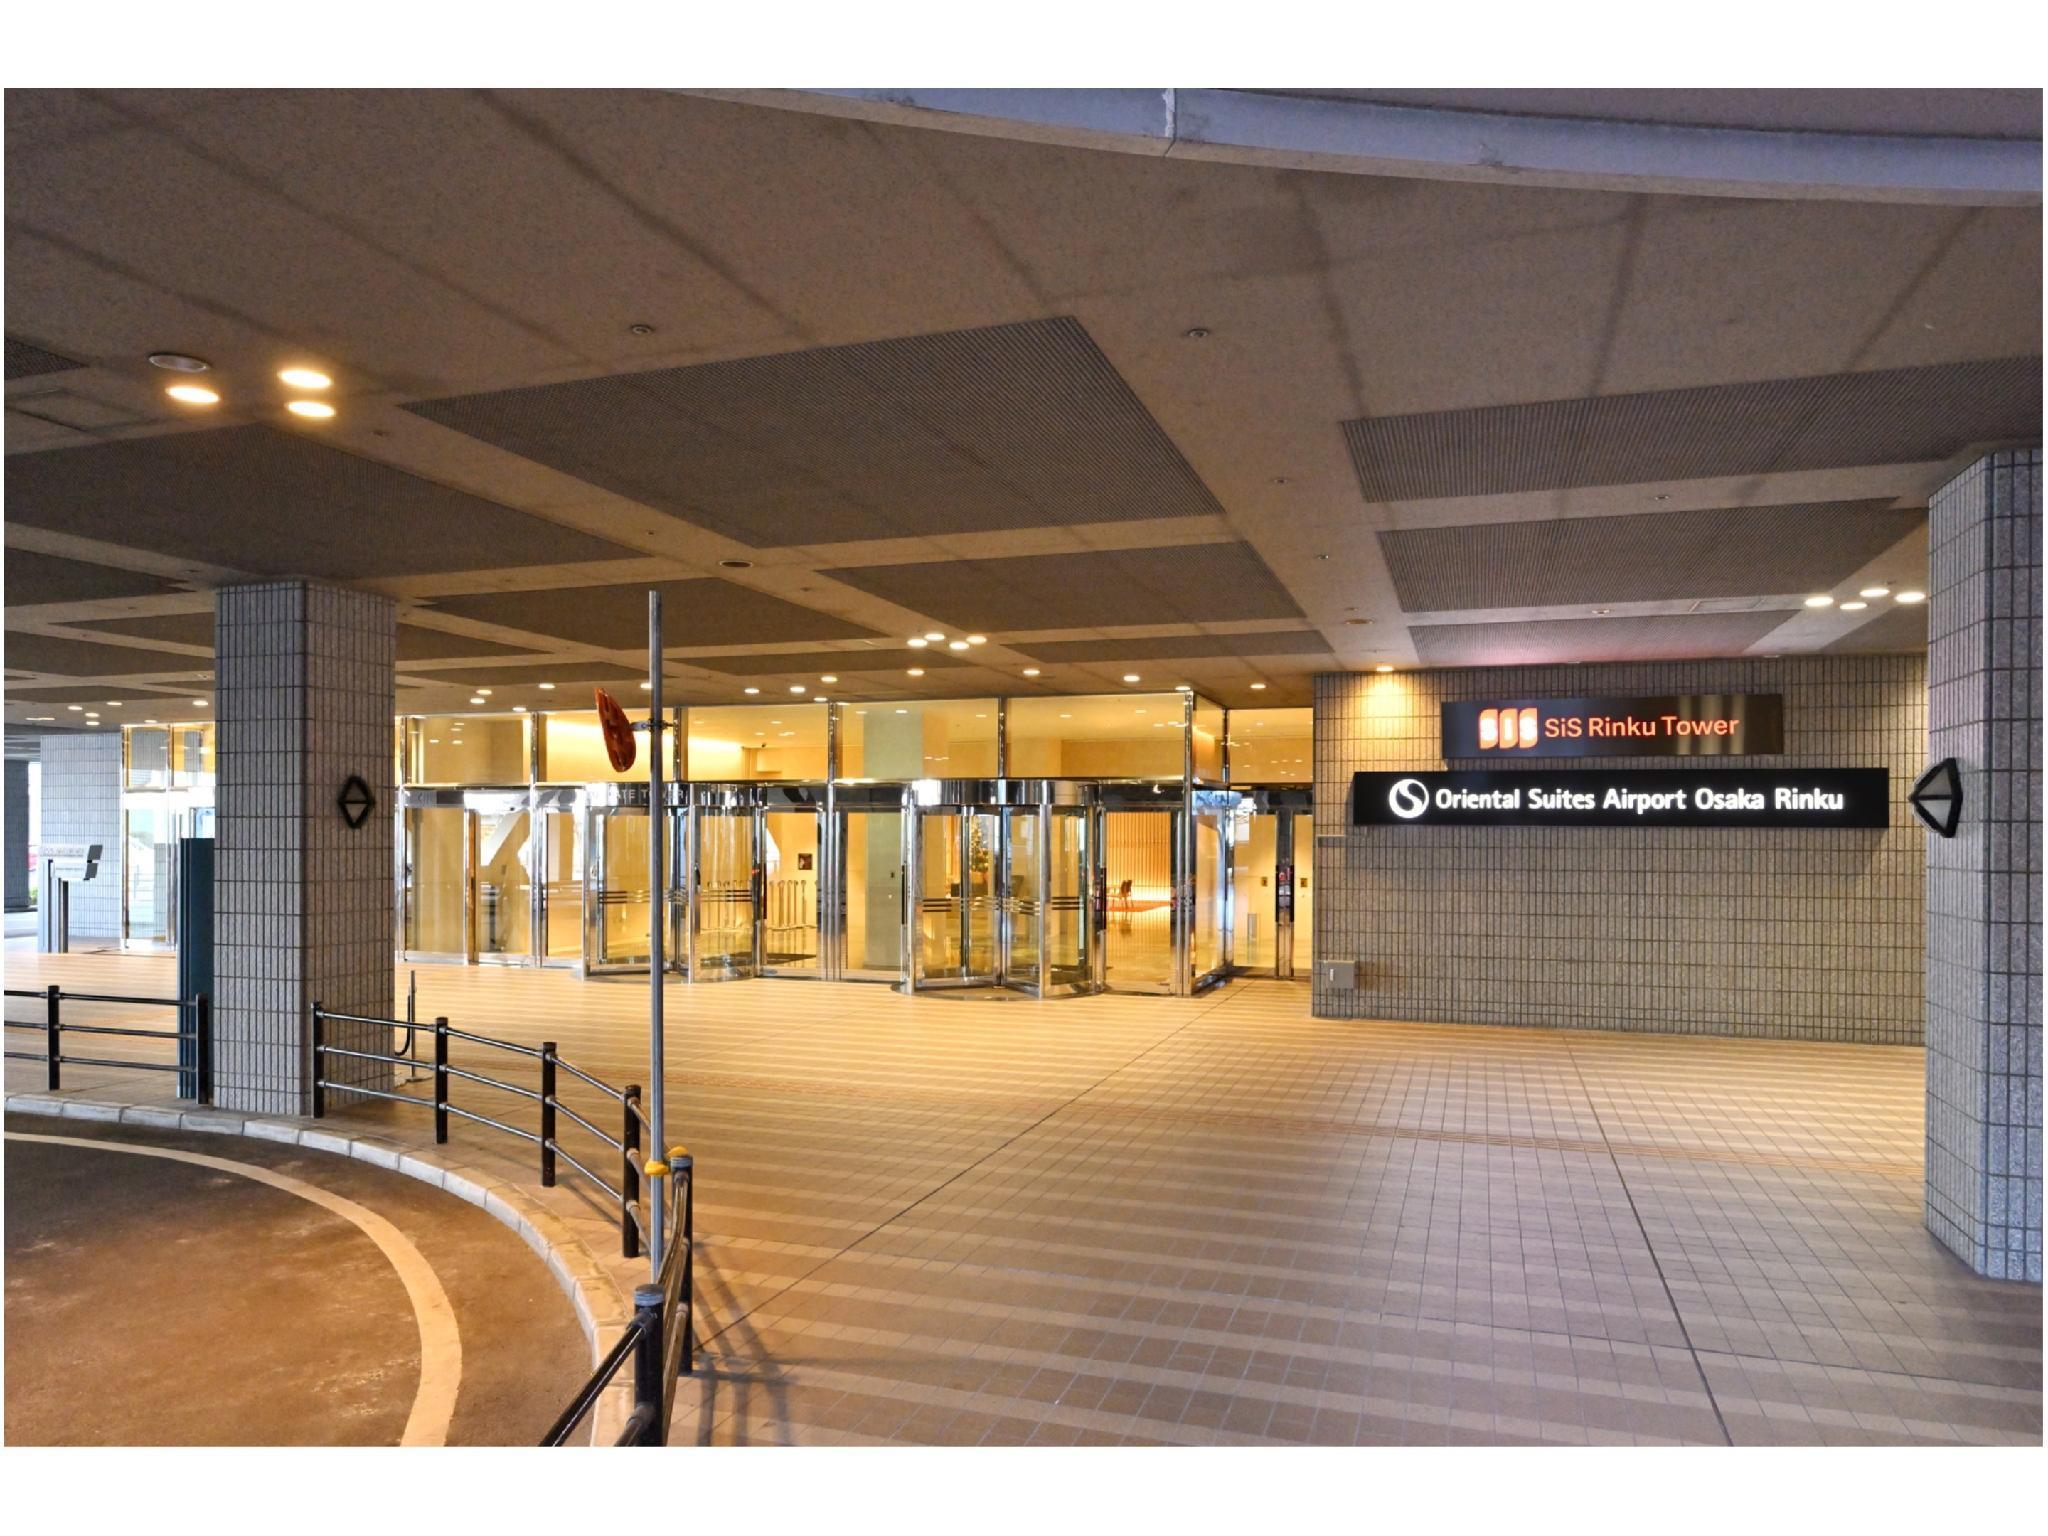 Oriental Suites Airport Osaka Rinku